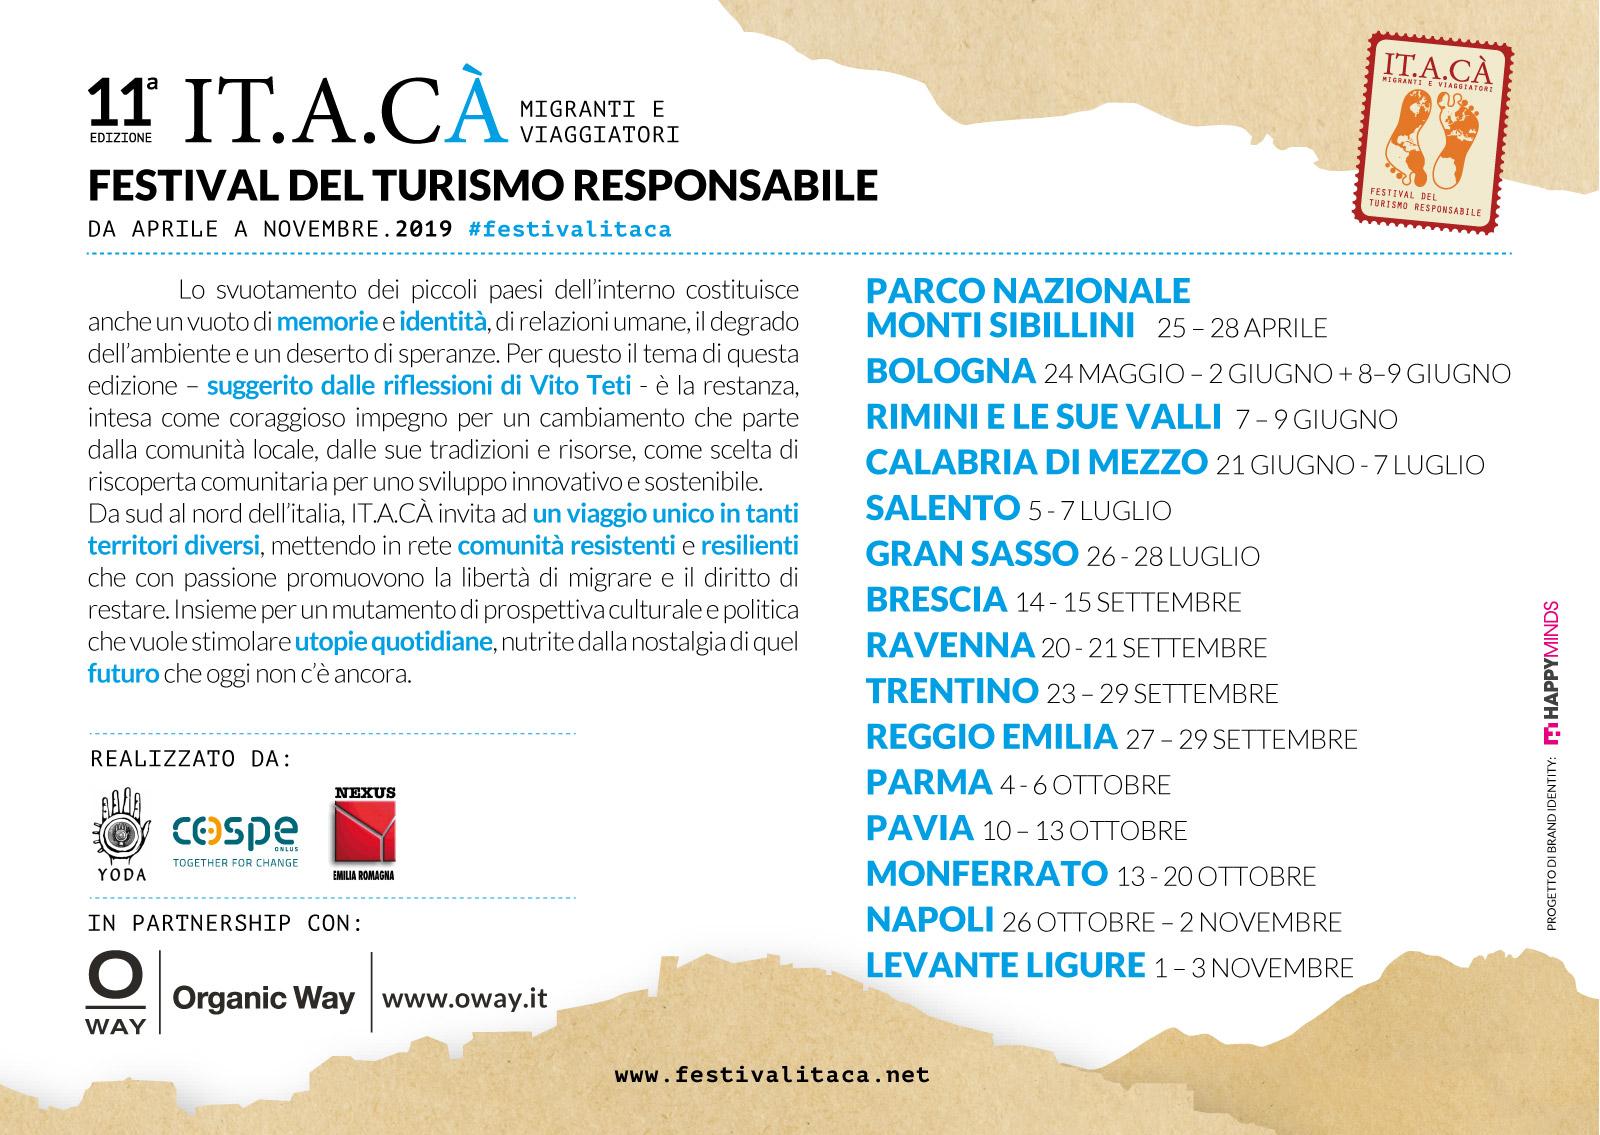 Restanza, tema del Festival ITACA' 2019